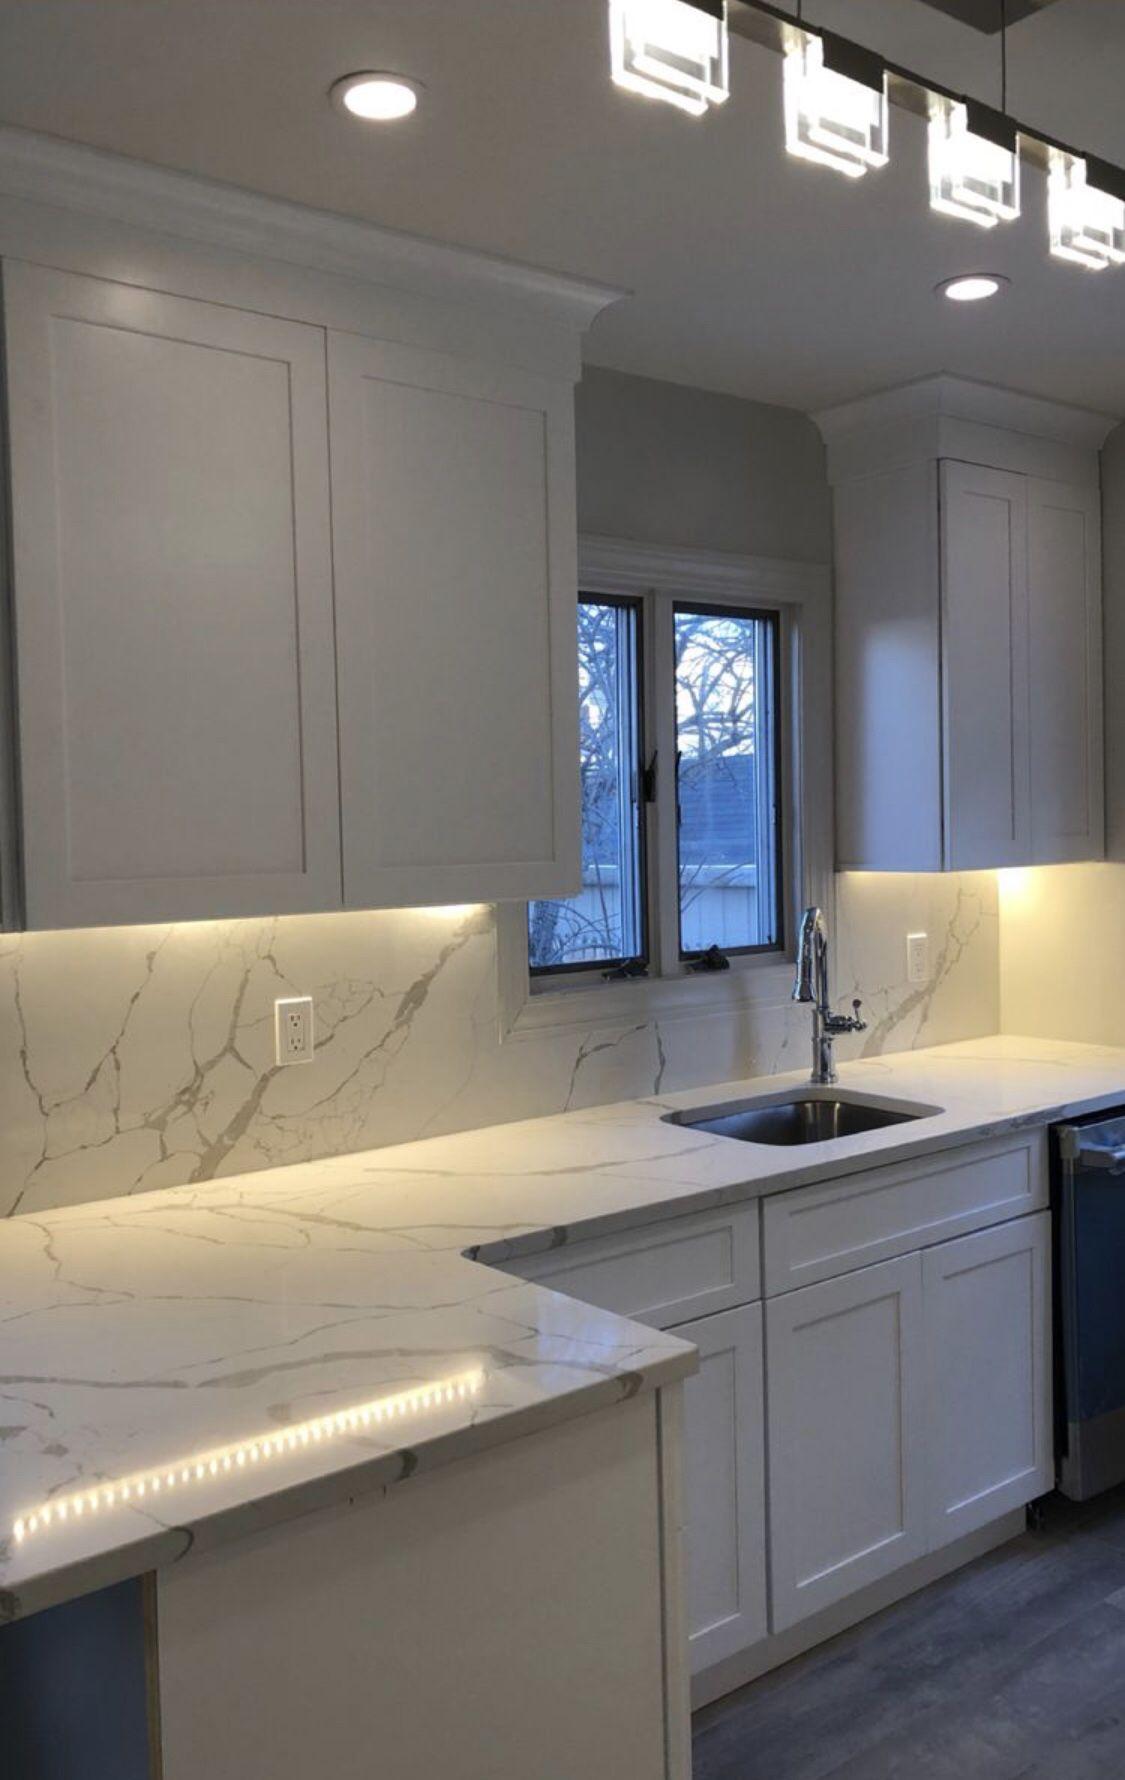 Fabuwood White Shaker Cabinetry With Msi Calacatta Laza Quartz